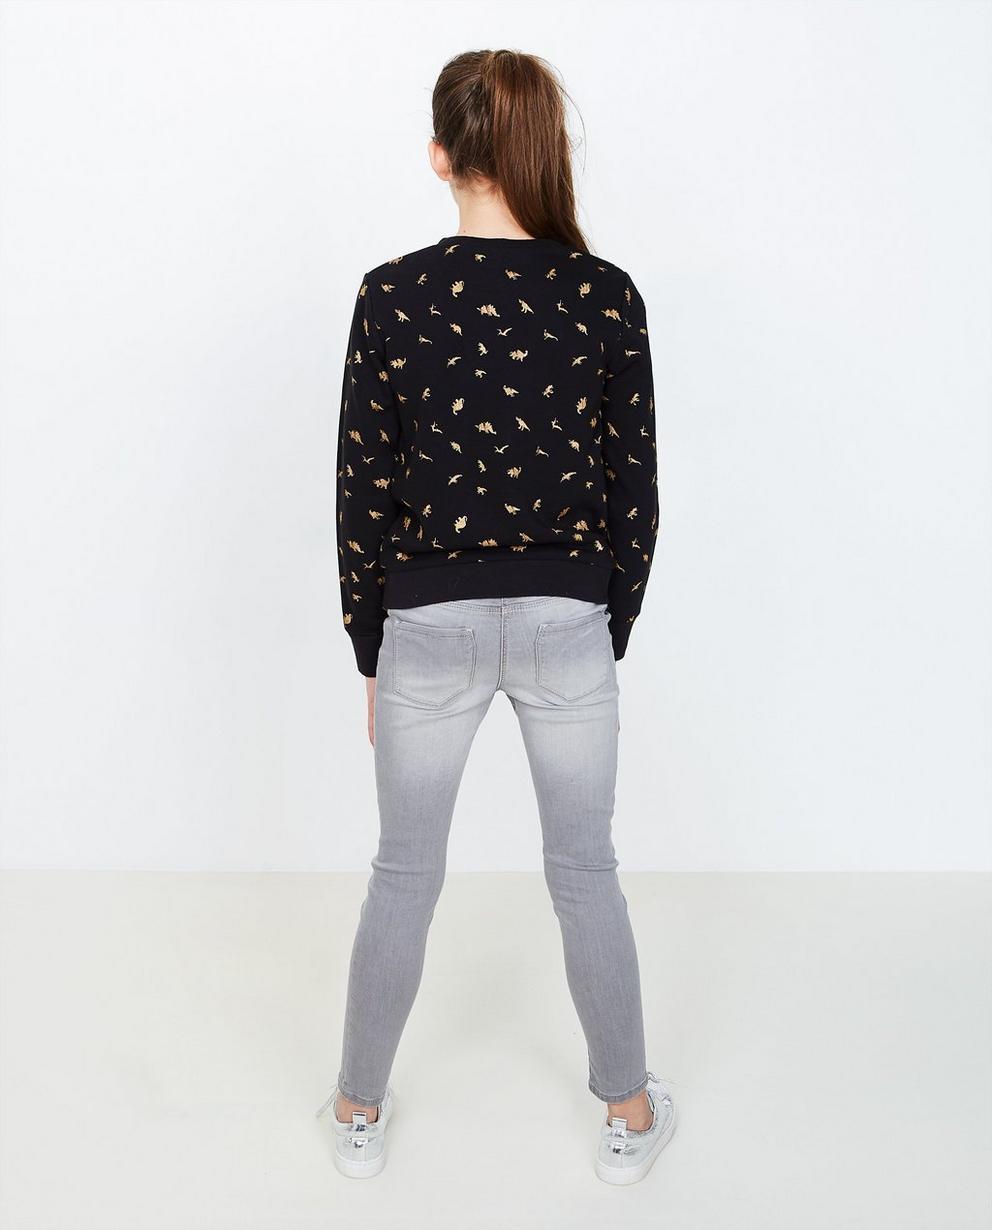 Zwarte sweater - #familystoriesjbc - JBC